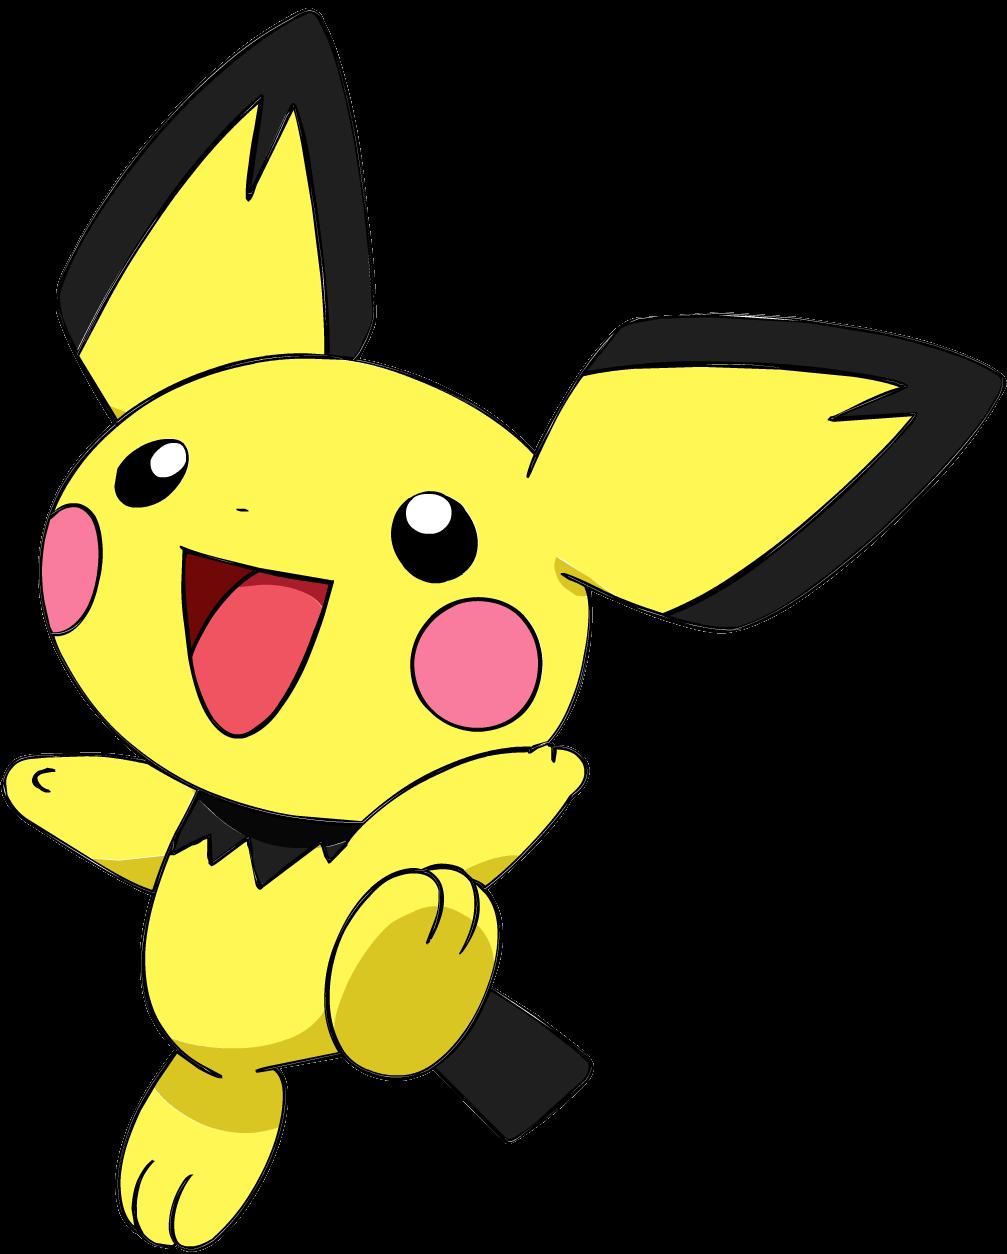 172Pichu OS anime 3.png - Pokemon PNG